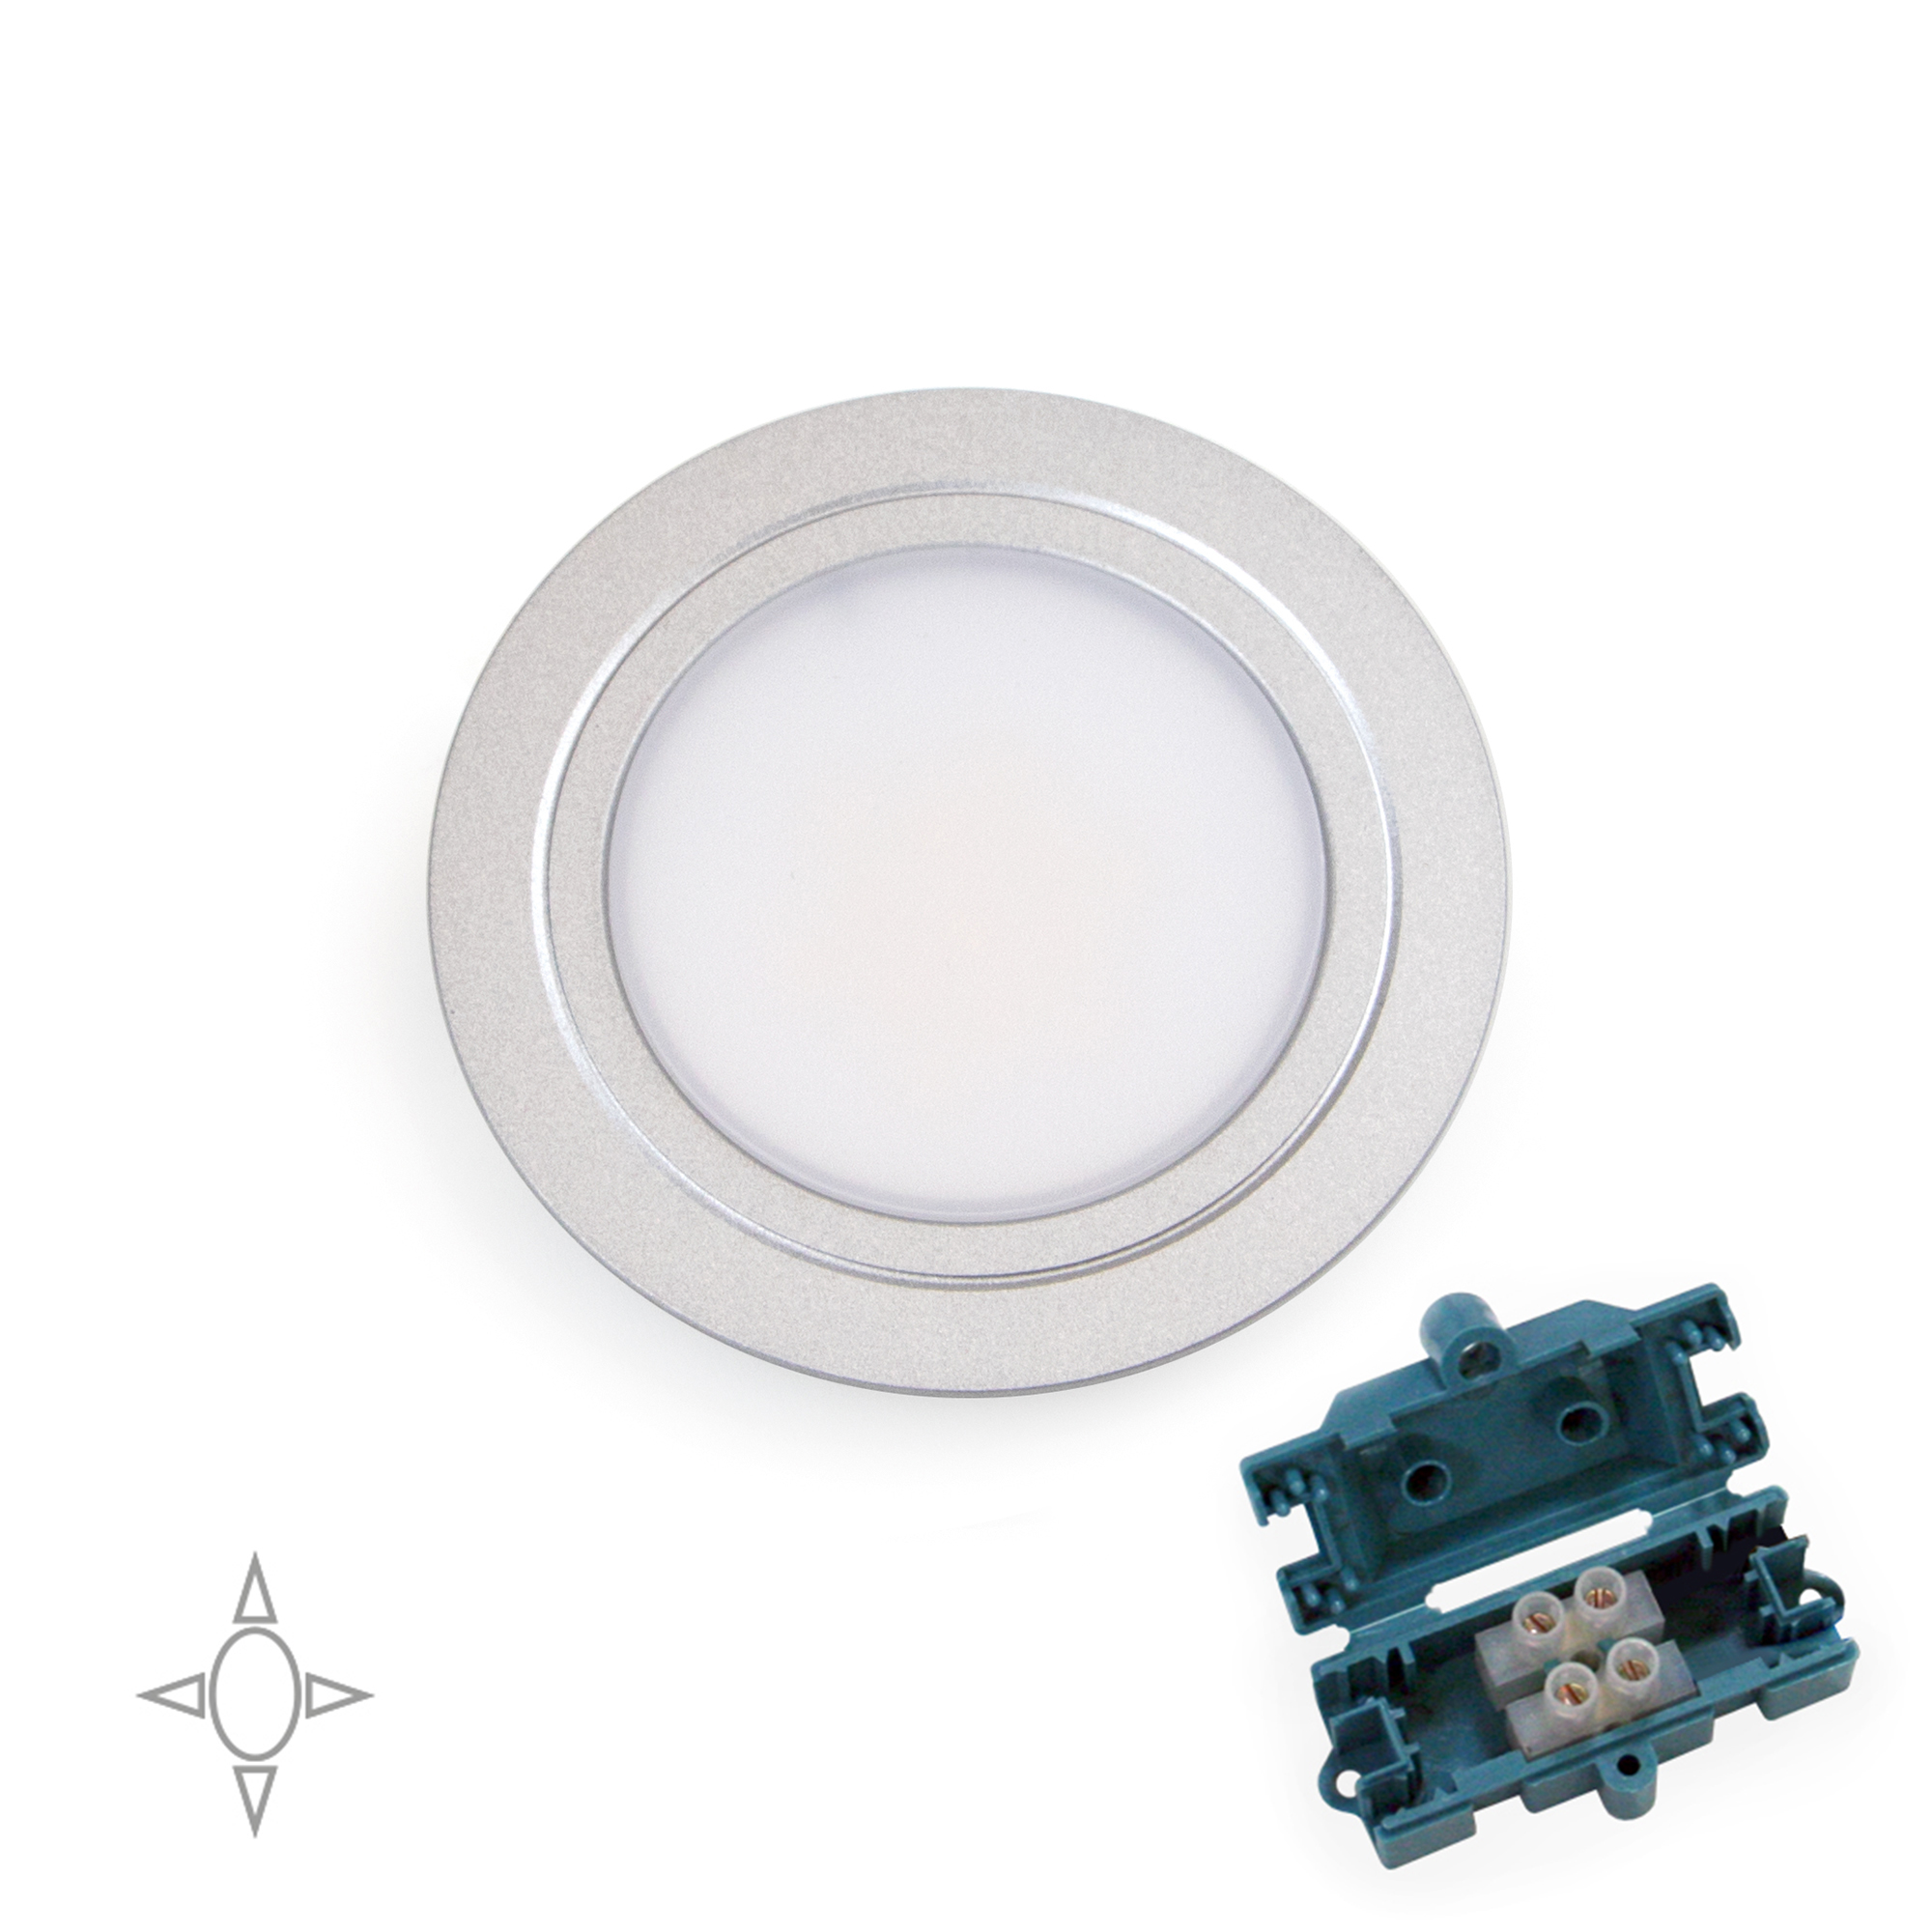 Emuca Faretto led per mobile, diametro 66 mm, a incasso, nessun convertitore necessario, luce bianca naturale, acciaio e plastic